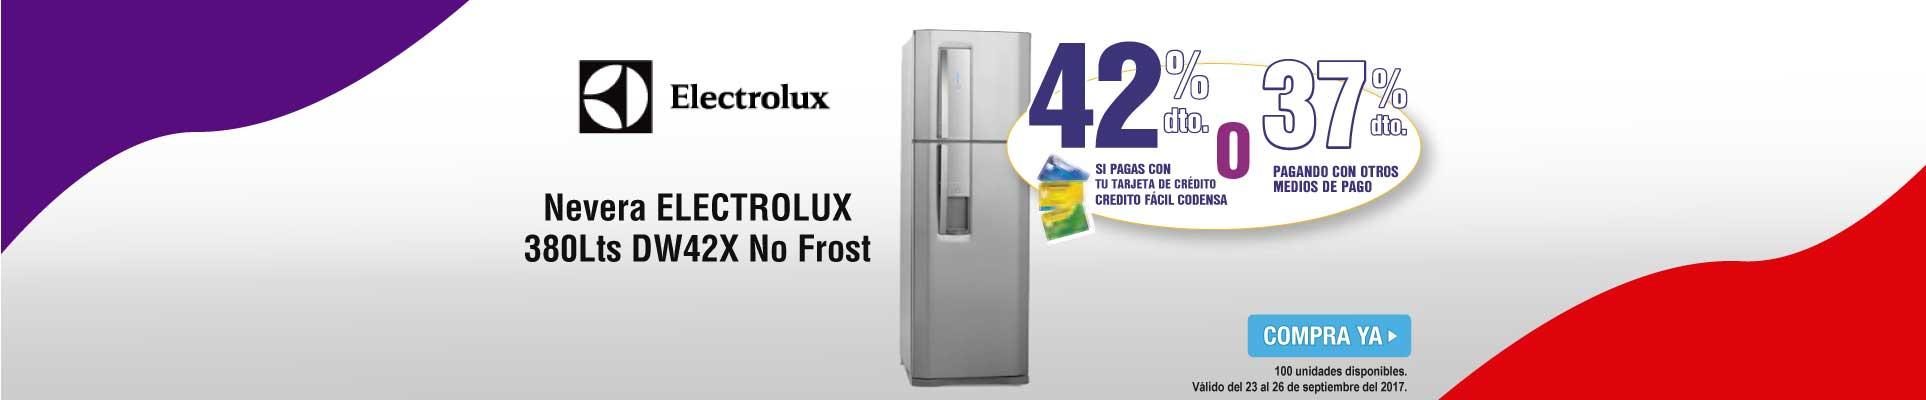 PPAL ALKP-4-lb-Nevera ELECTROLUX 380Lts DW42X No Frost-prod-septiembre23-26